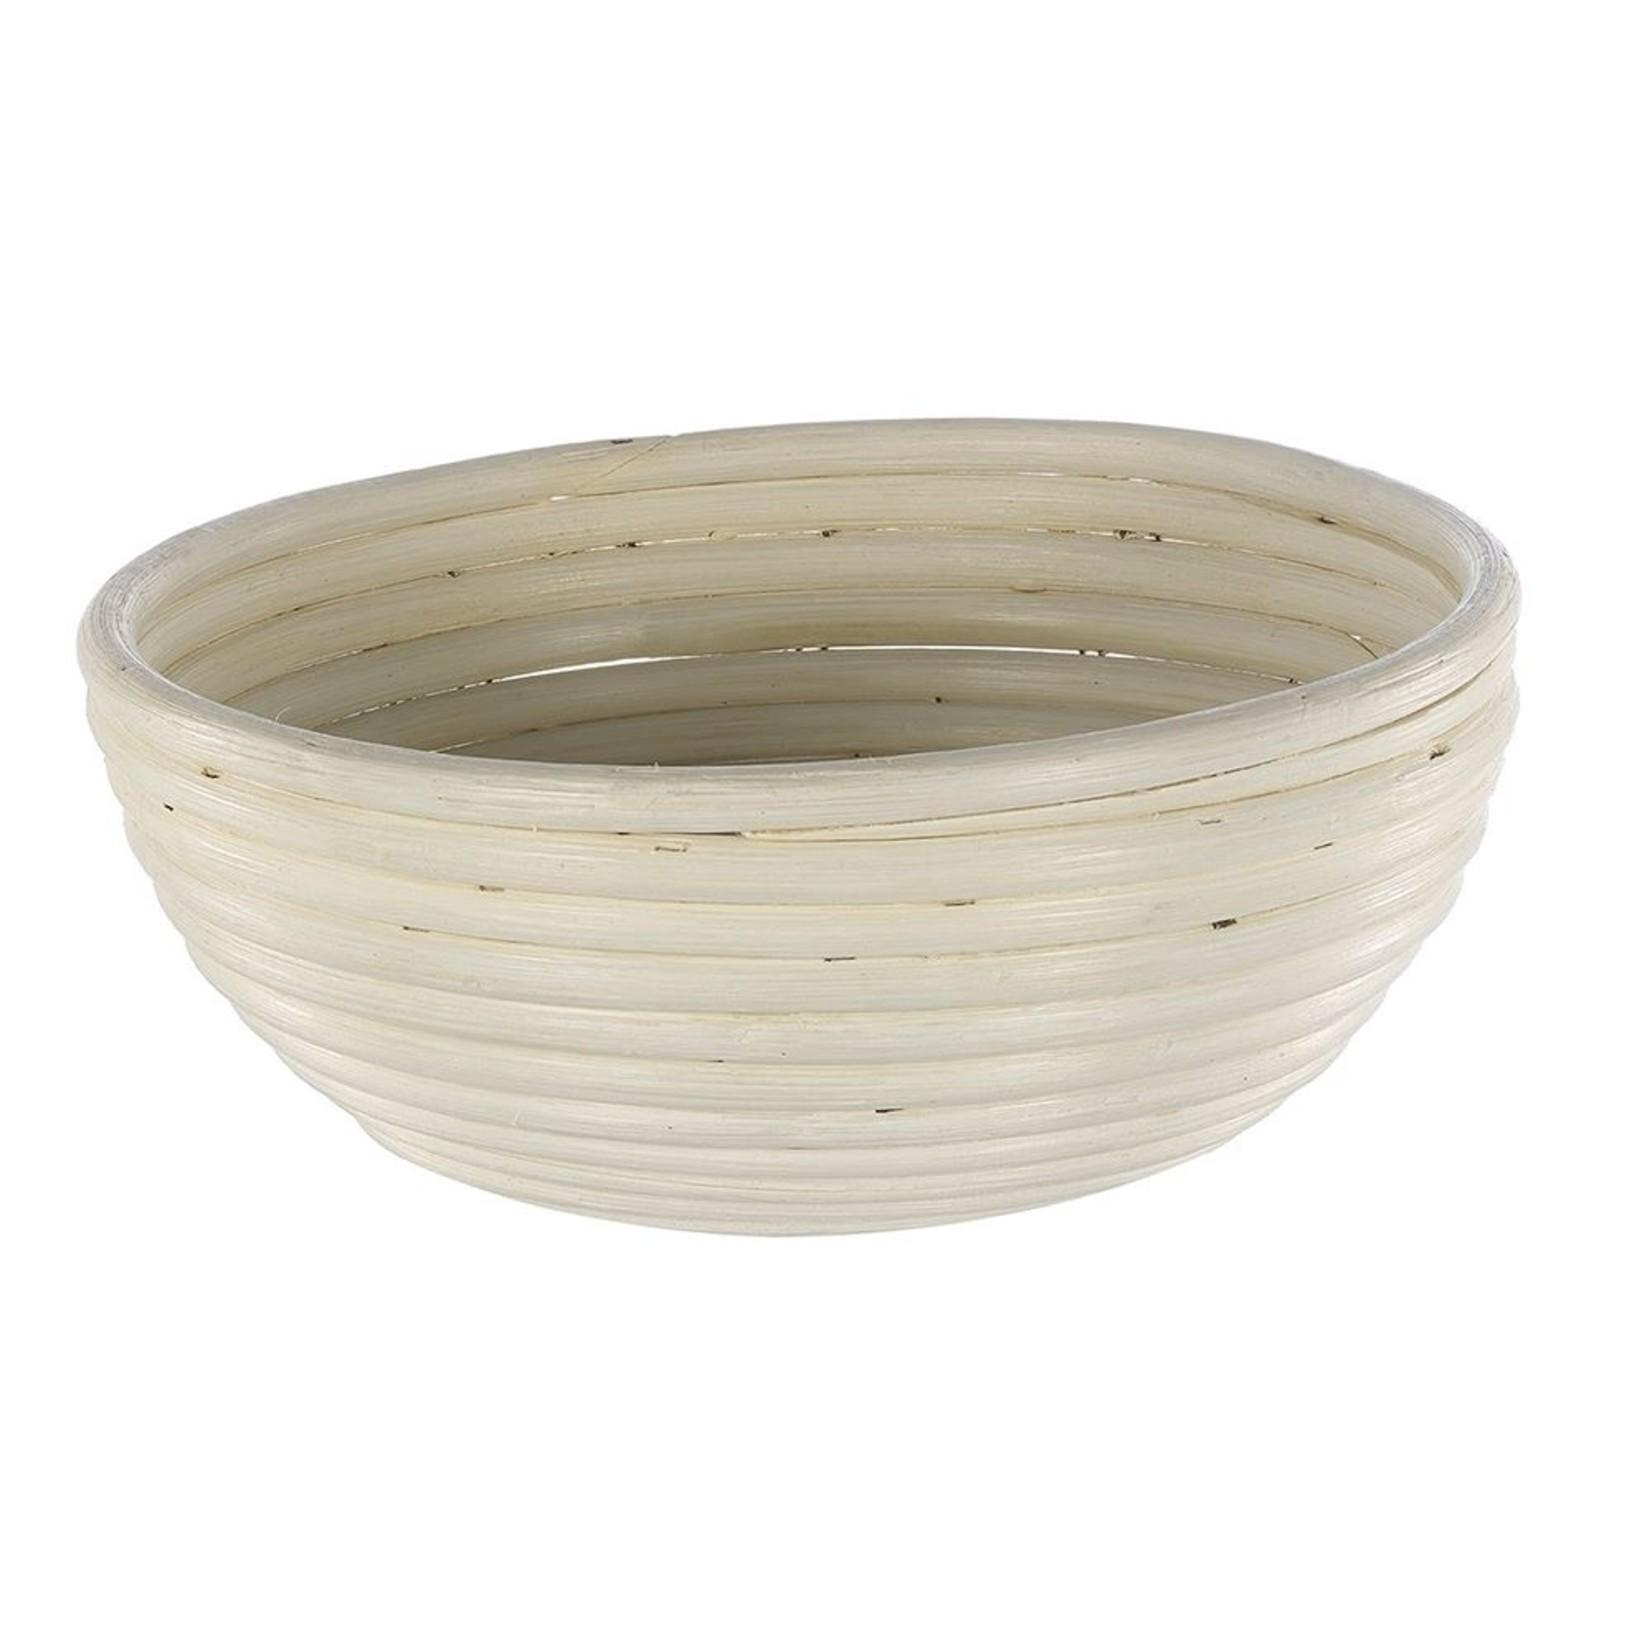 Eddington's Banneton Bread Proofing Basket